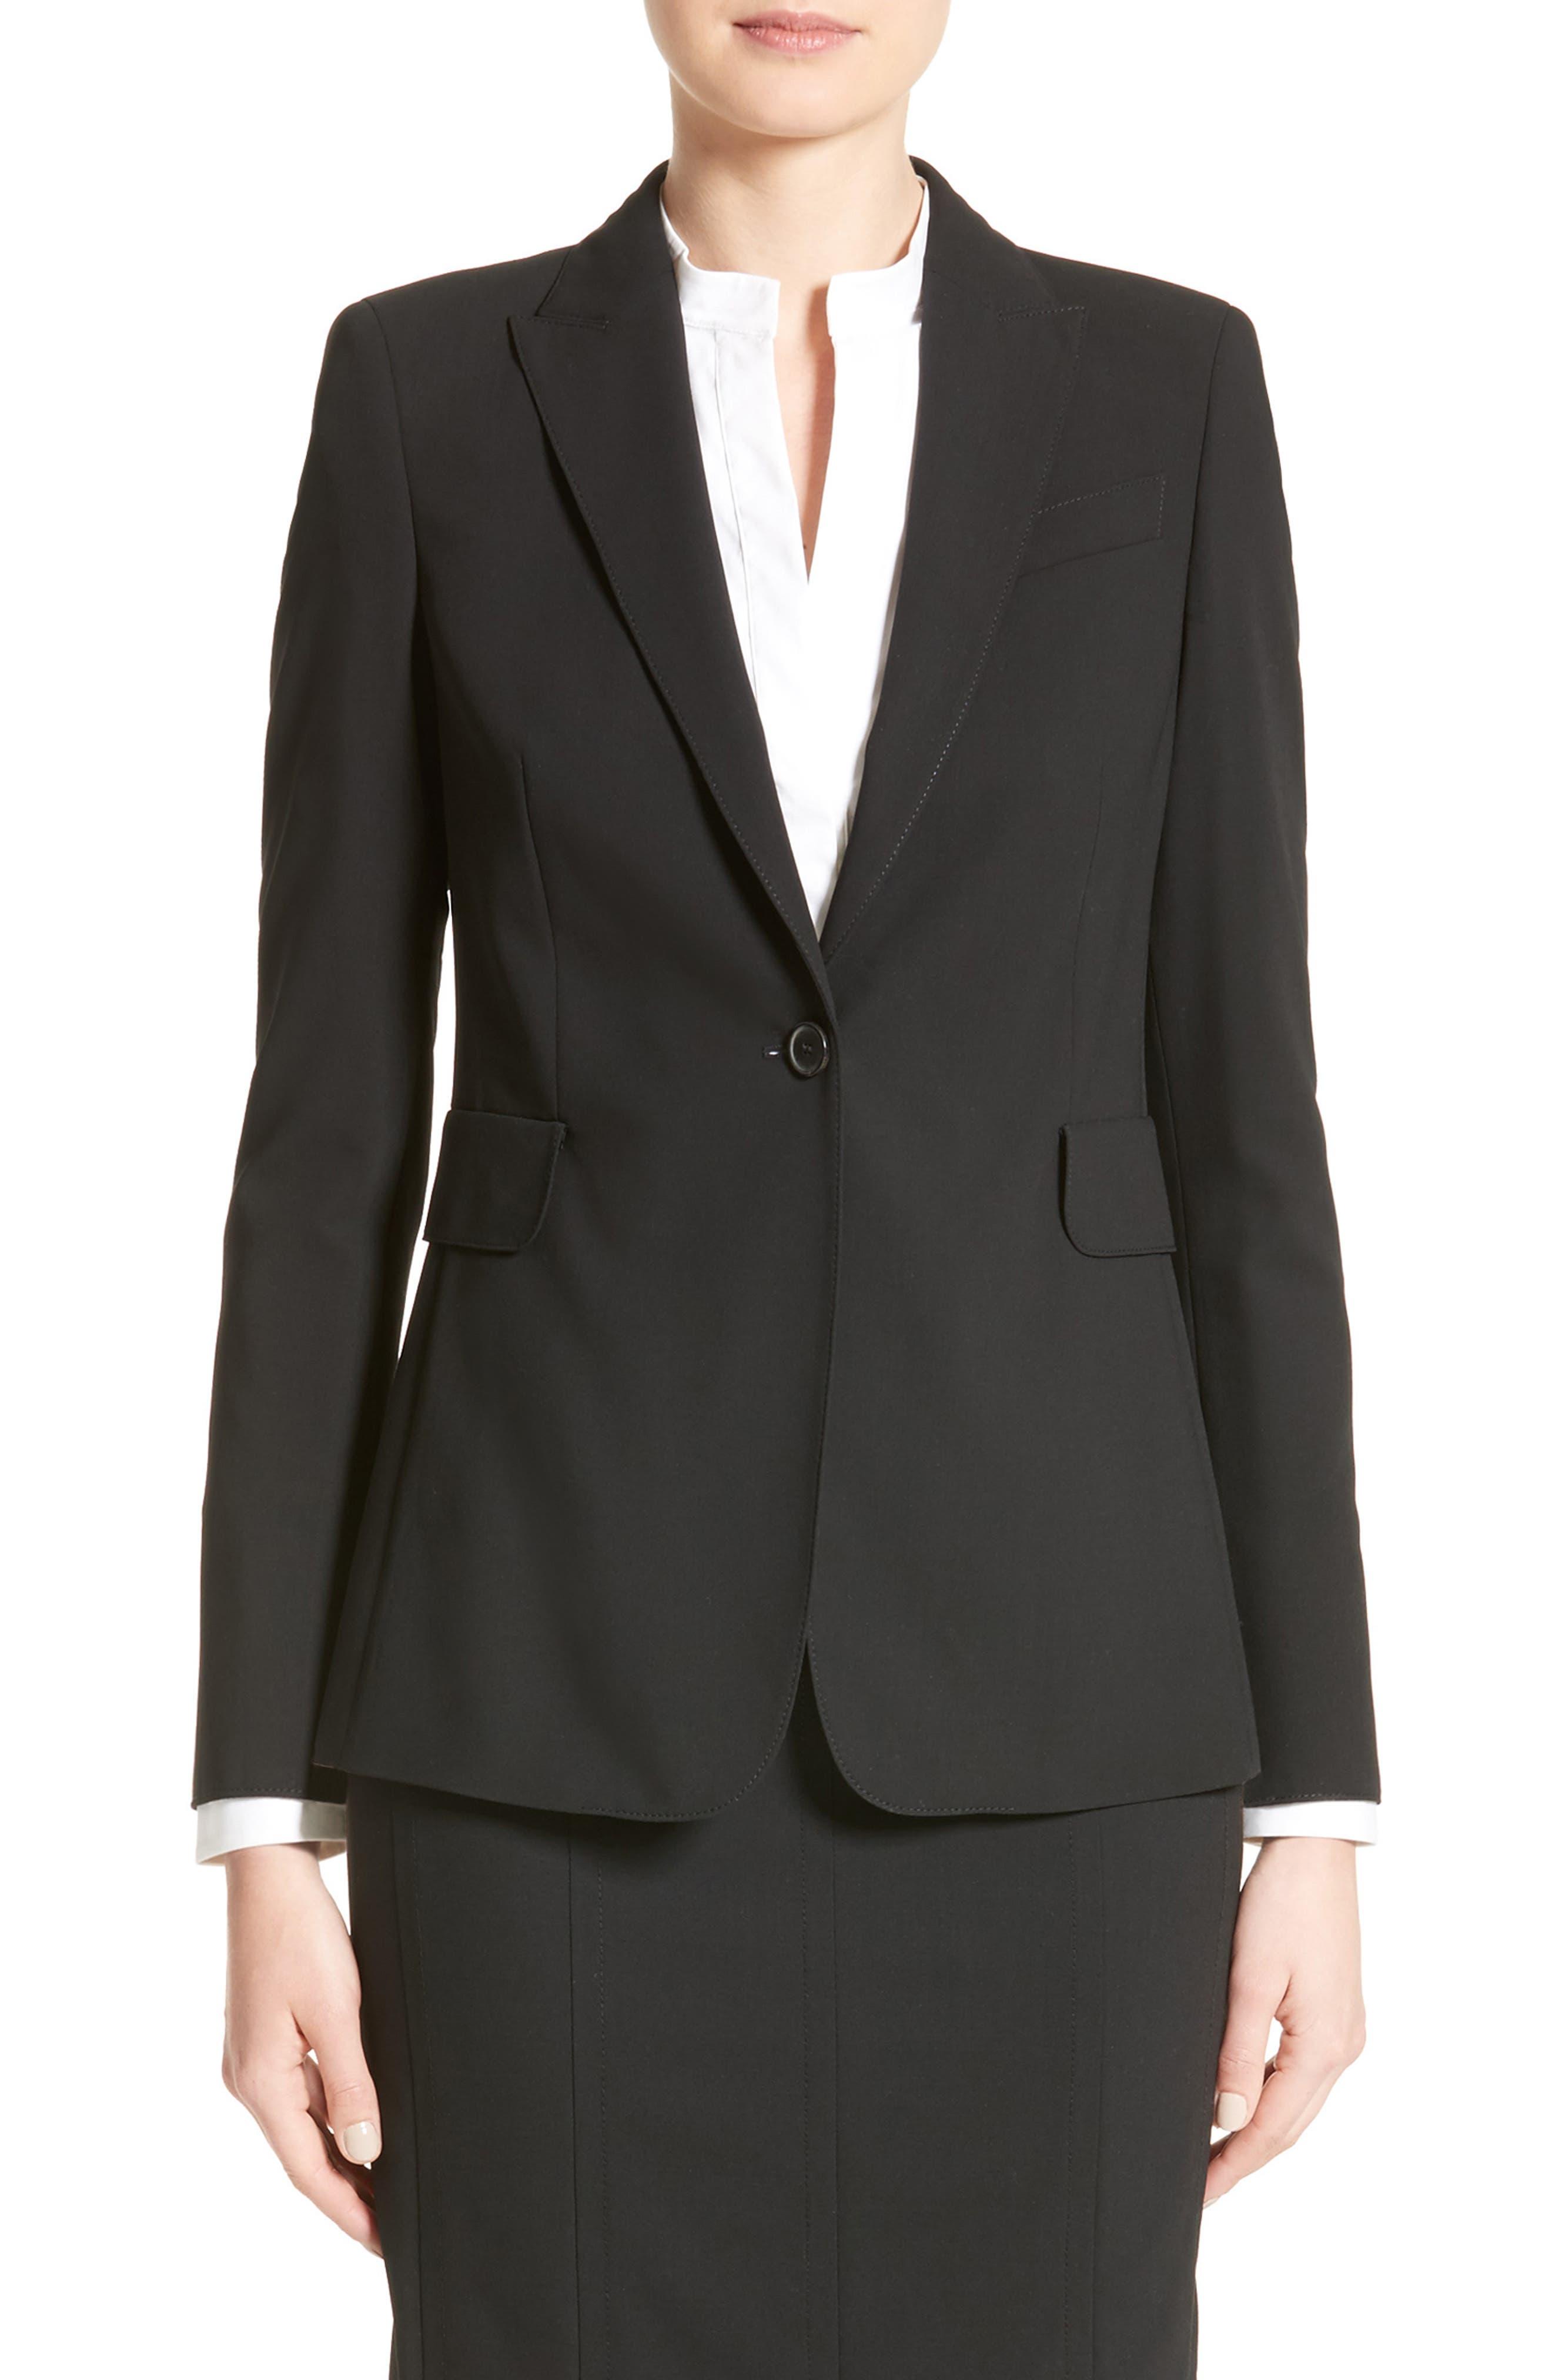 AKRIS PUNTO, Long One-Button Jacket, Main thumbnail 1, color, BLACK